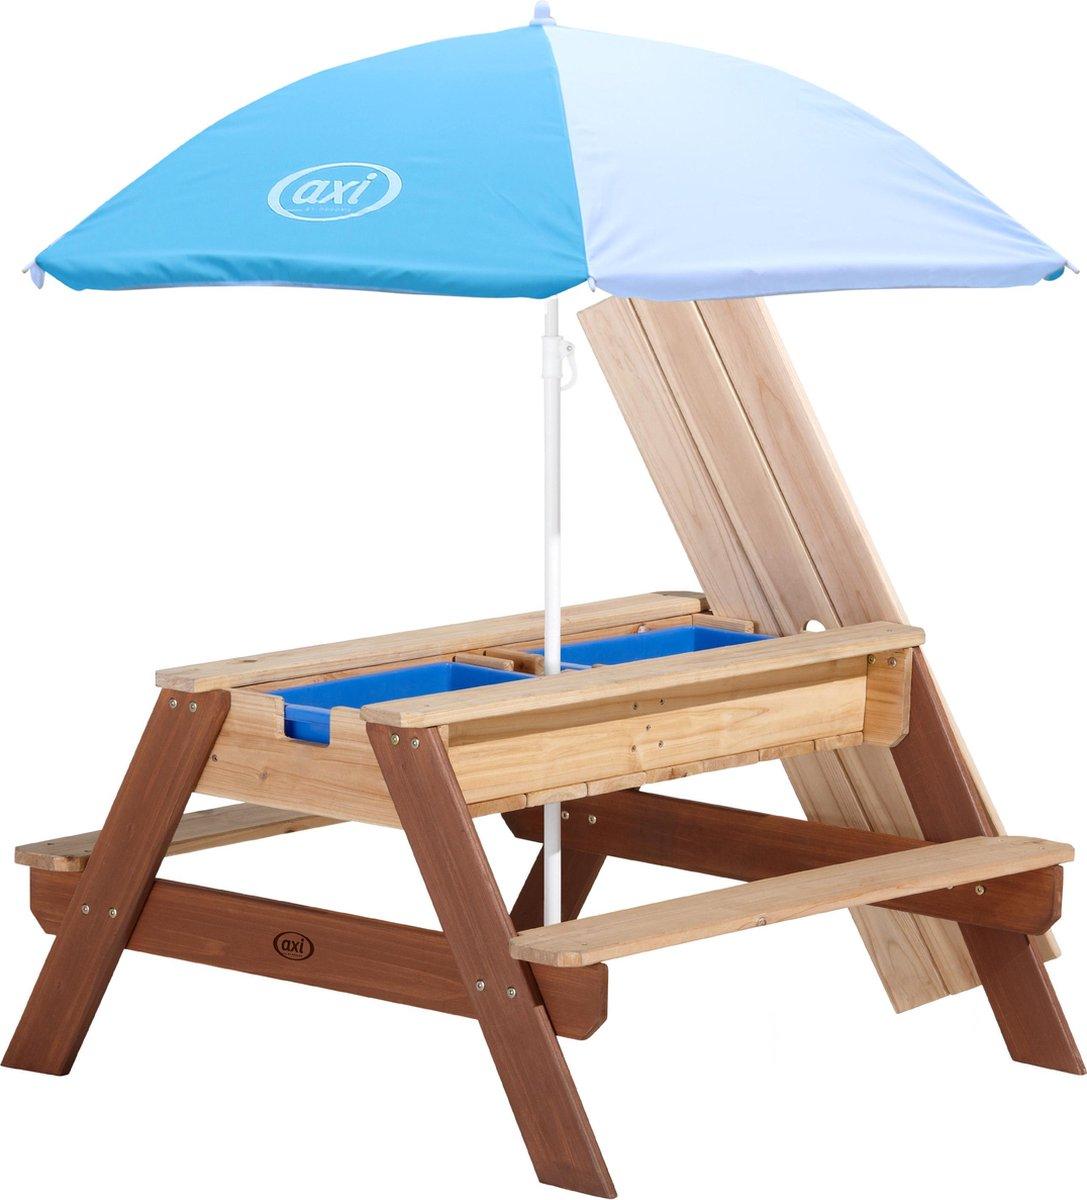 AXI Nick Zand & Water Picknicktafel Bruin - Verstelbare Parasol   FSC Hout